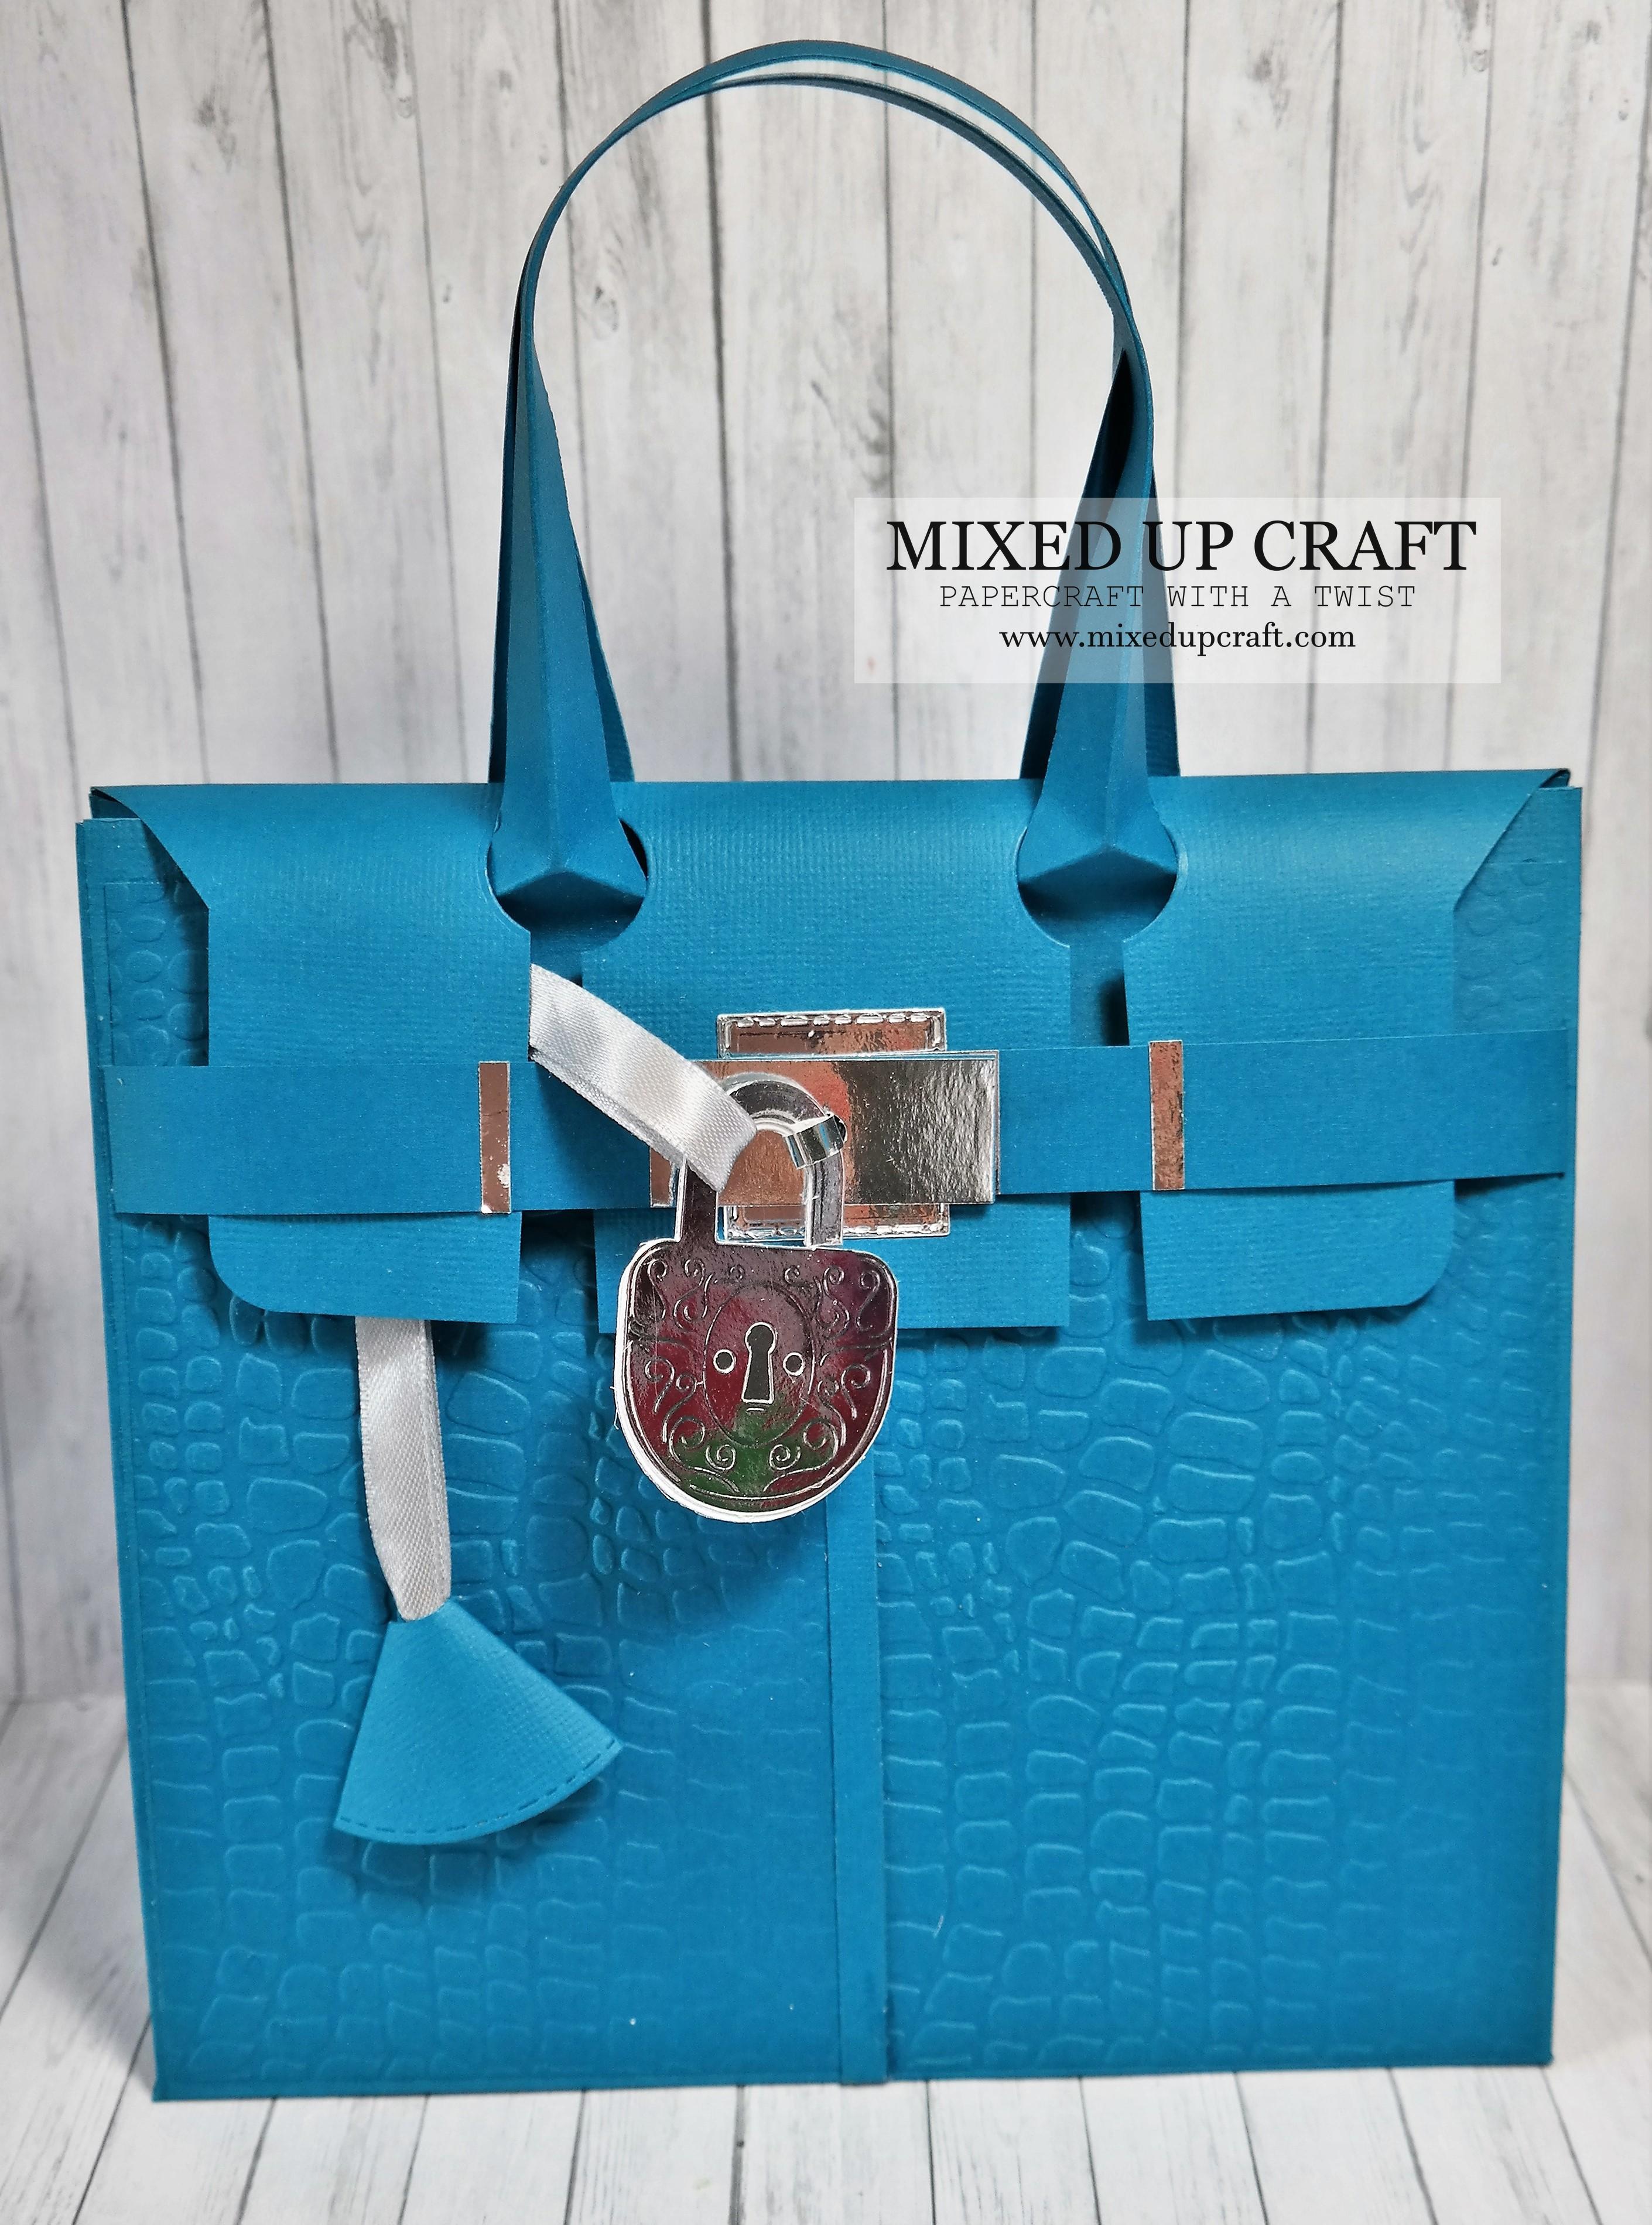 SAM 3324 - Free Designer Handbags Giveaway